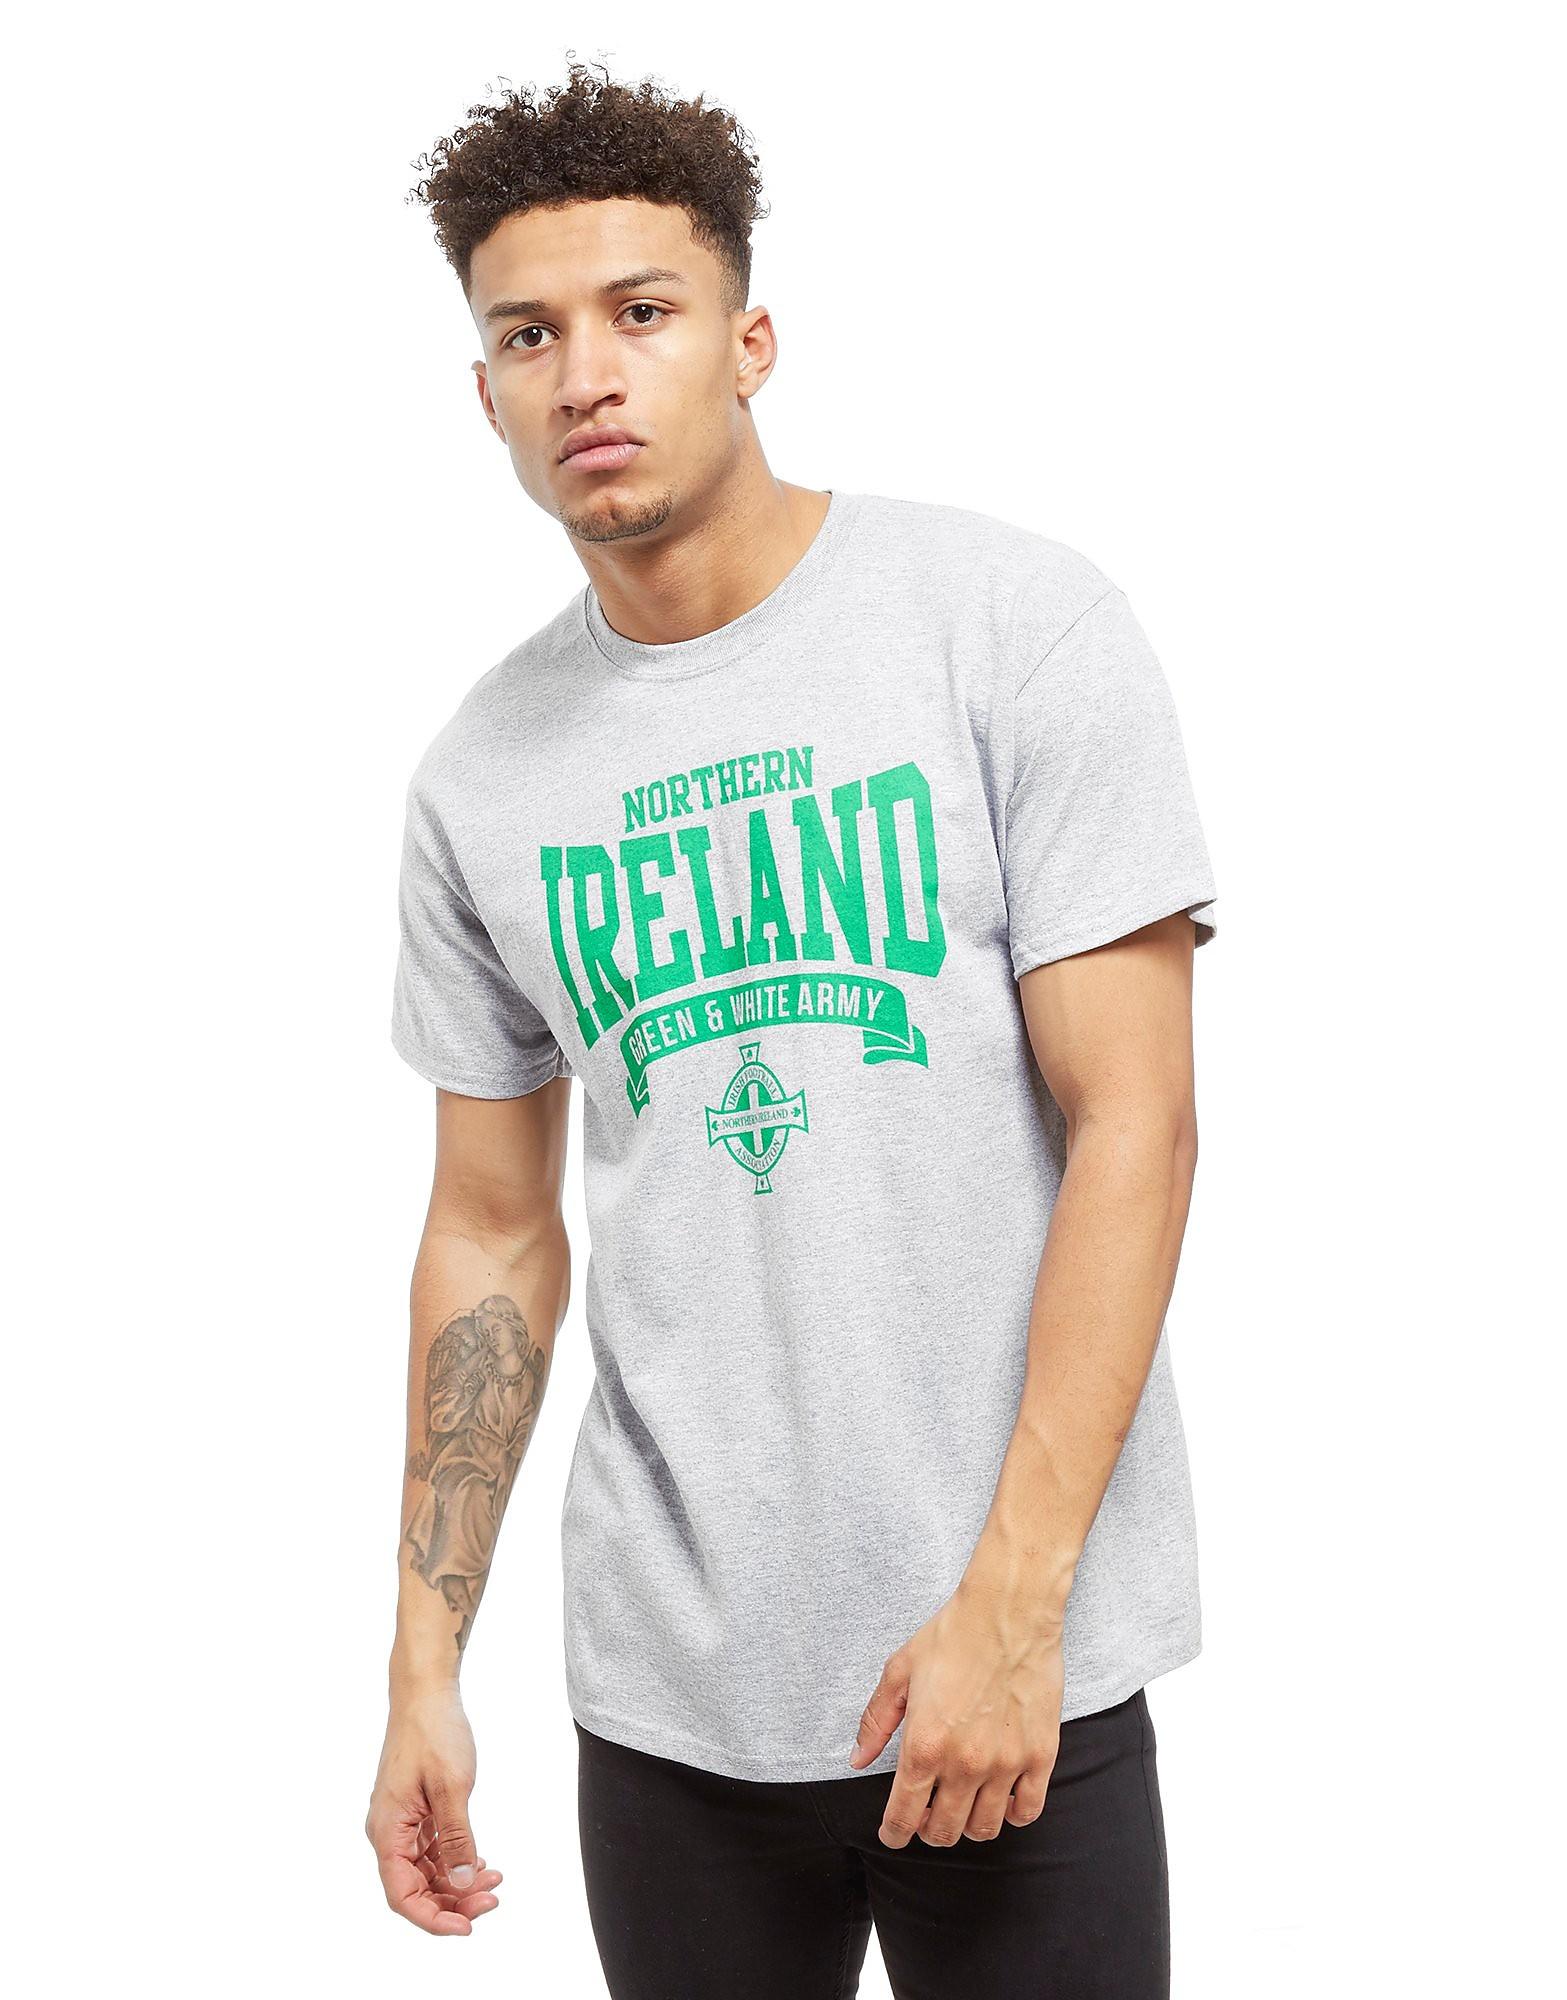 Official Team Nordirland Scroll T-Shirt - Heather Grey - Mens, Heather Grey